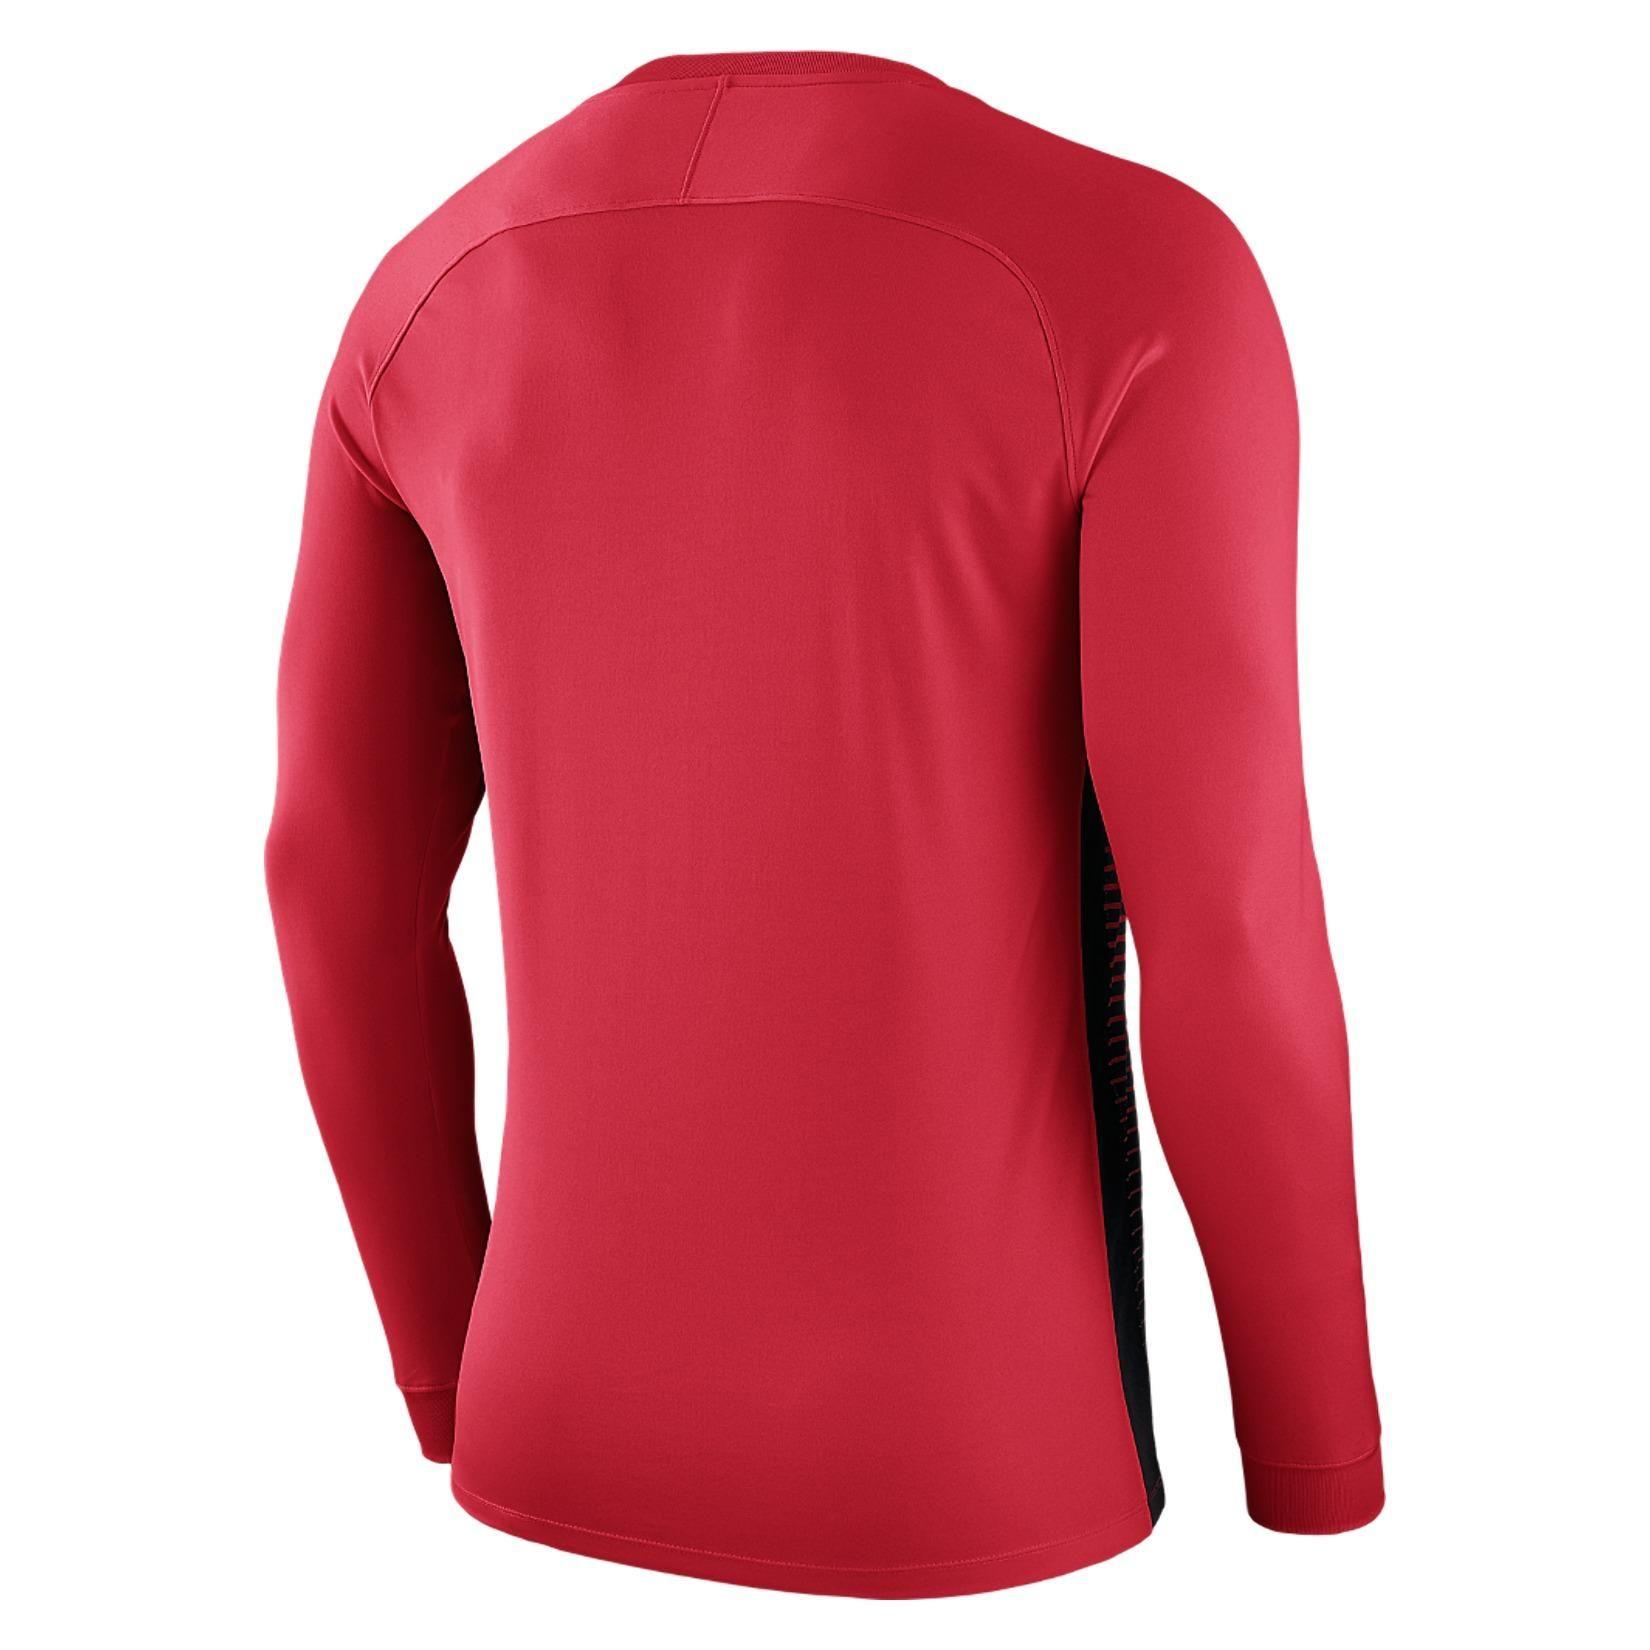 e9ec3c4ac Nike Precision Iv Long Sleeve Football Shirt - Kitlocker.com ...